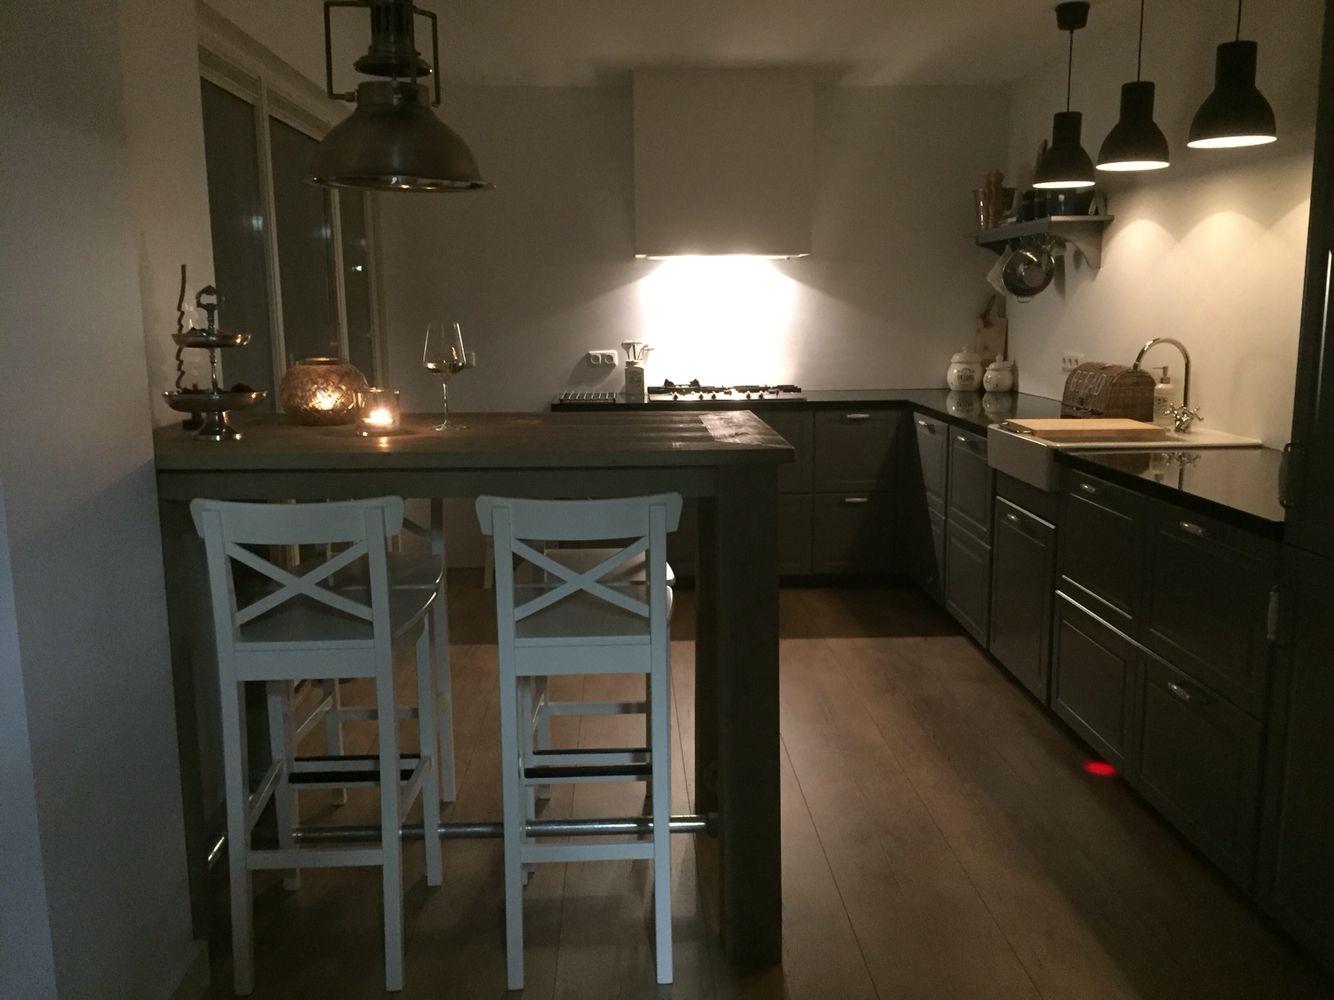 Bodbyn ikea keuken grijs met diy steigerhouten bar de verbouwing pinterest searching - Bar design keuken ...